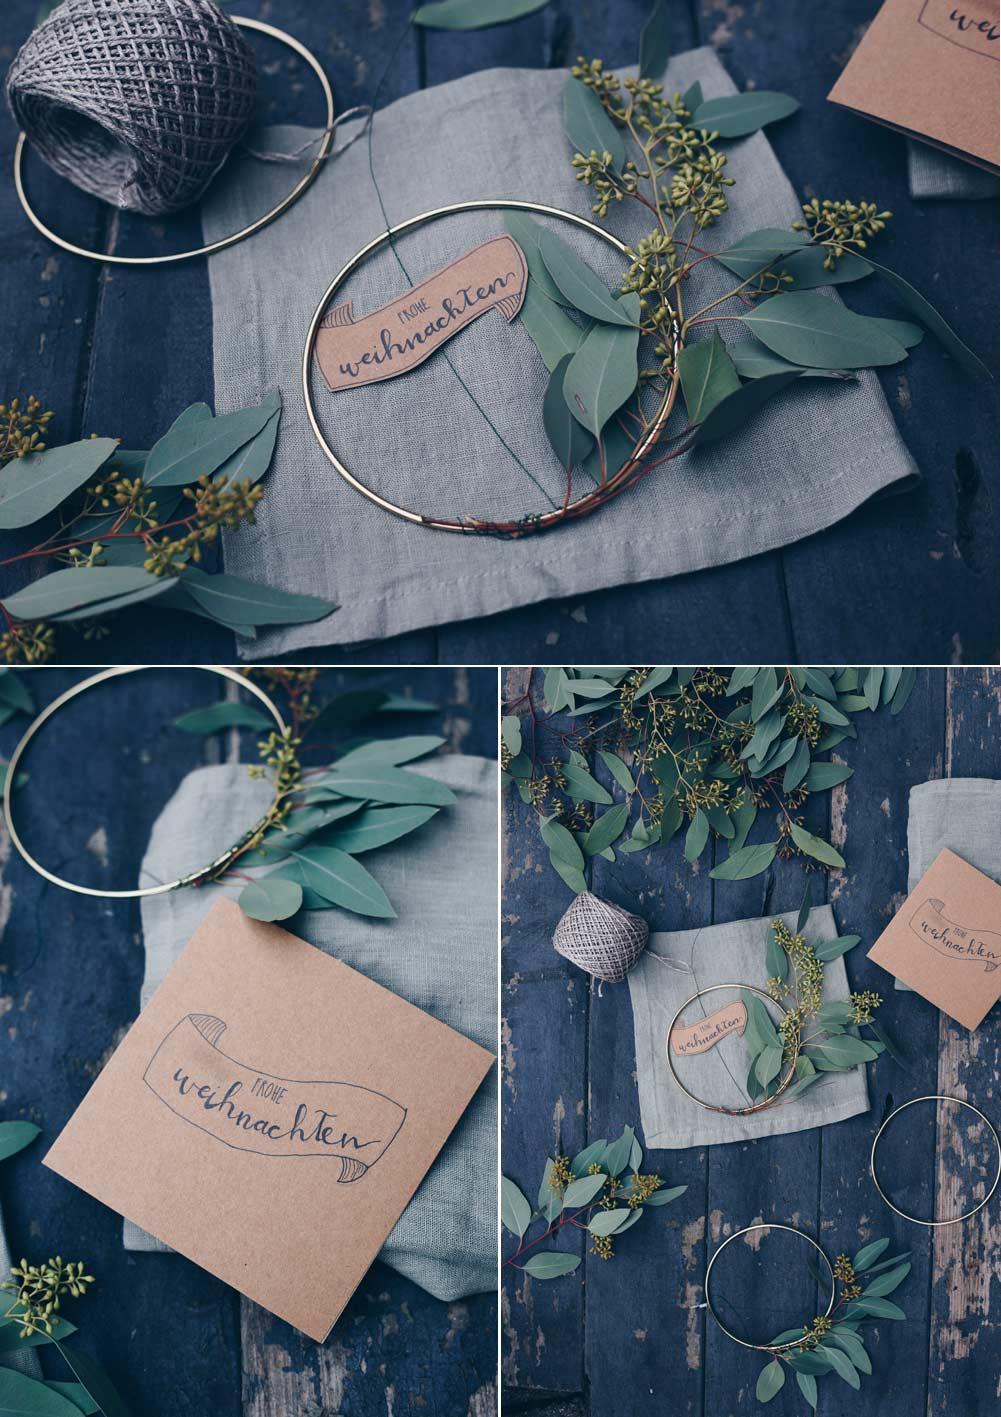 Geschenkidee Winterkranz Mit Eukalyptus Selbermachen Diy Deko Idee